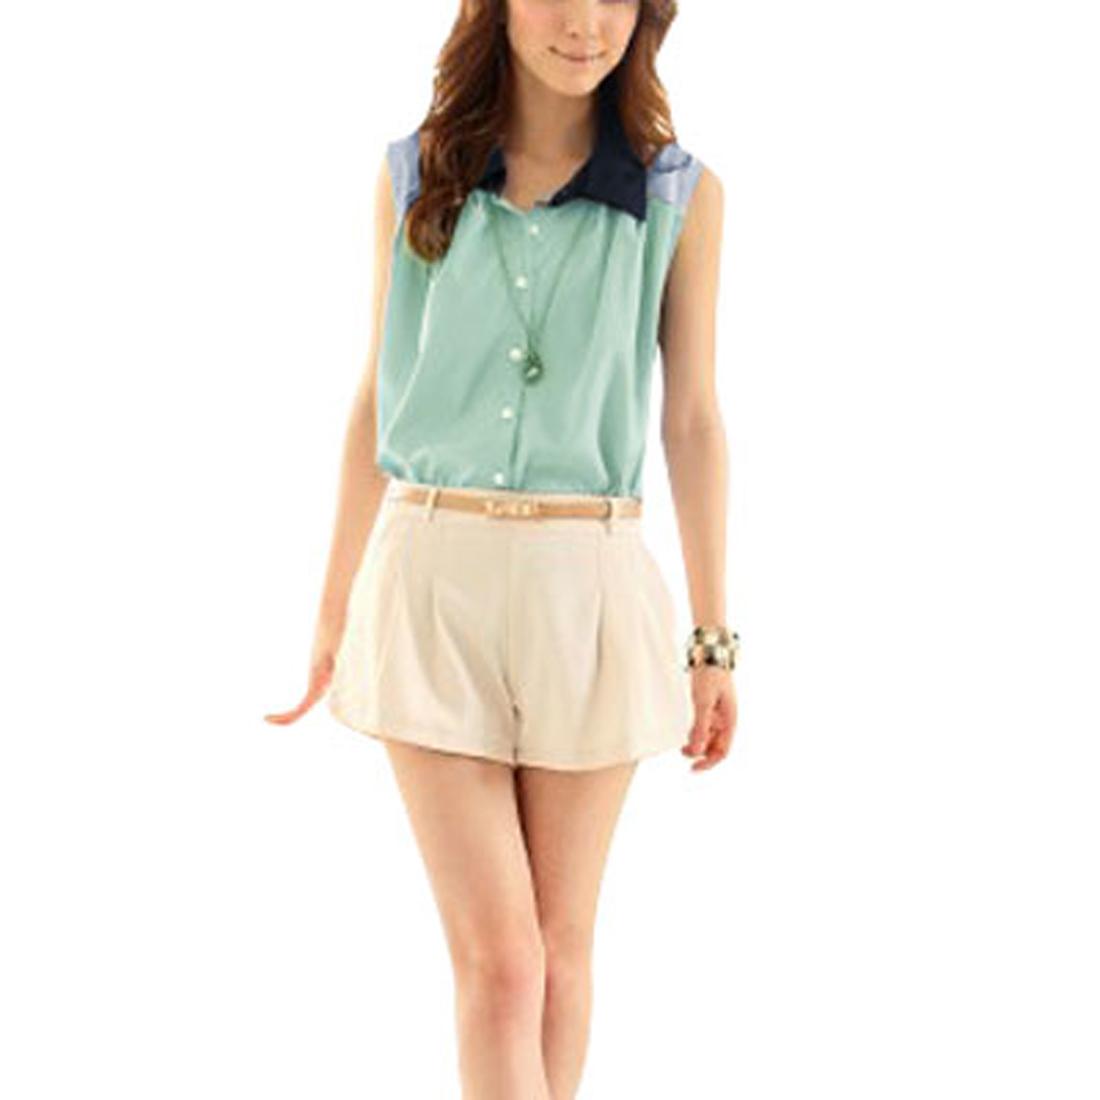 Women Point Collar Single Breast Sleeveless Blouse Light Green Top XS